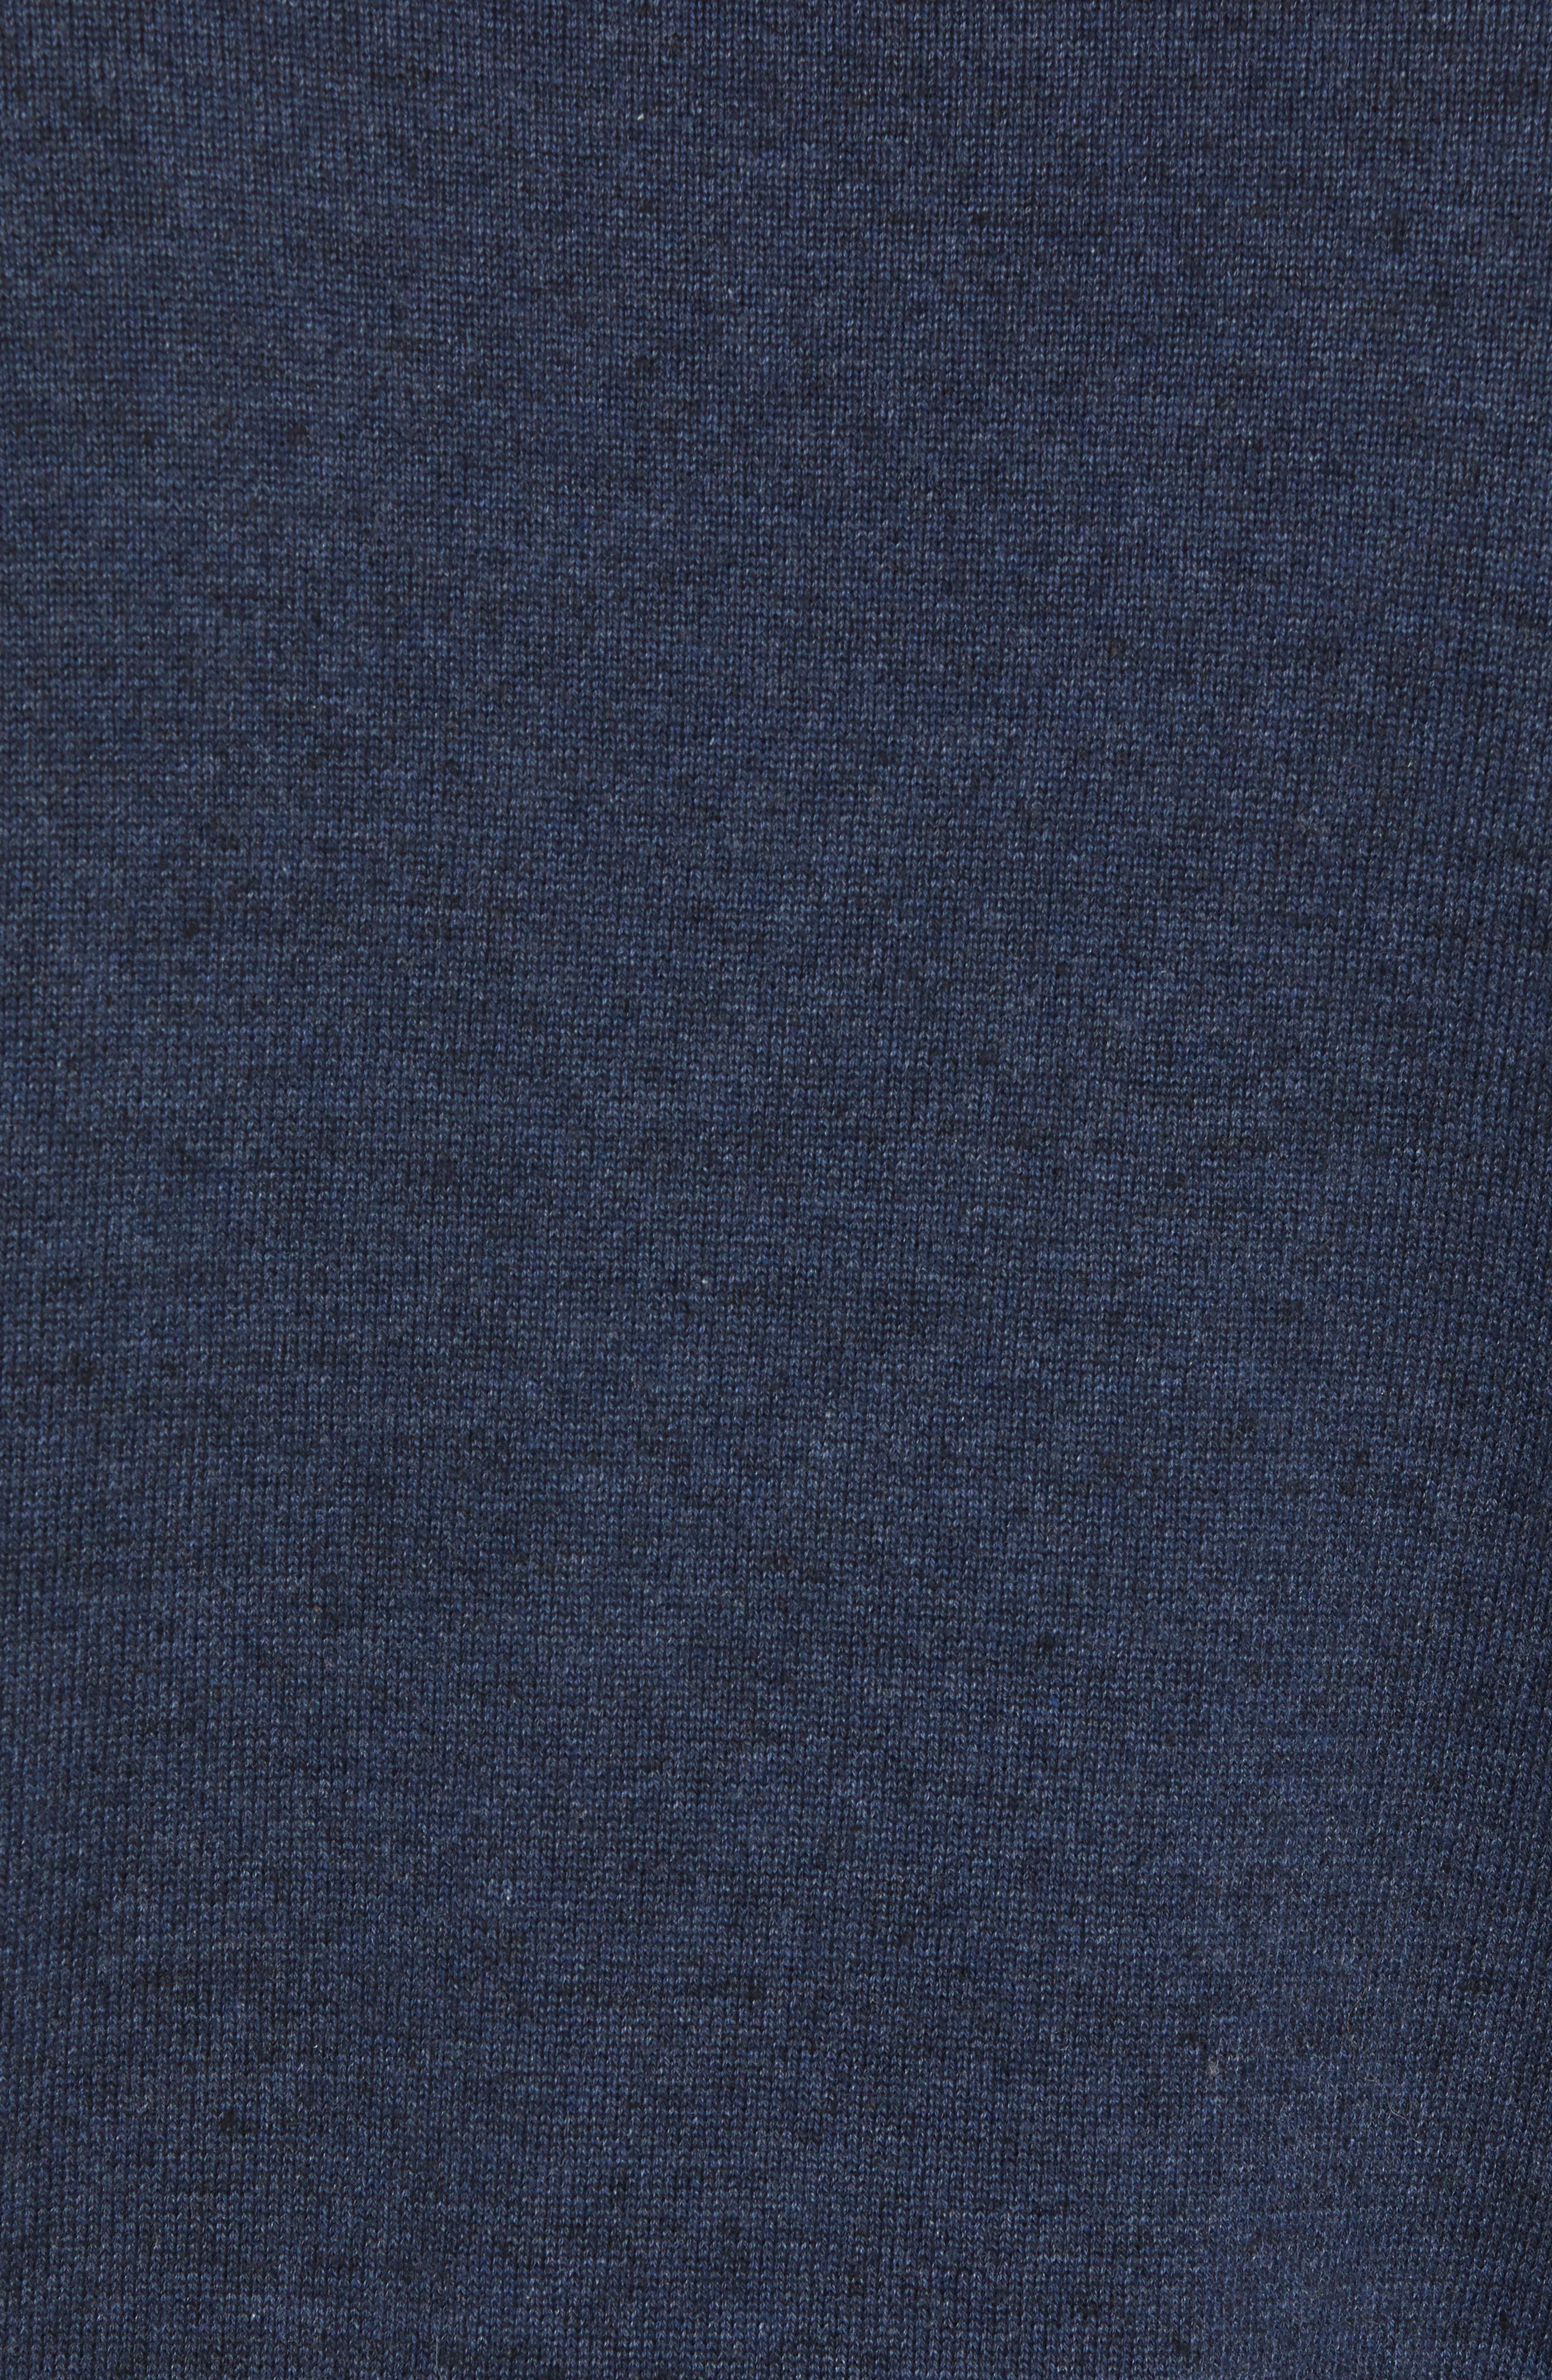 McGill Slim Fit Crewneck Sweater,                             Alternate thumbnail 5, color,                             HEATHER NAVY